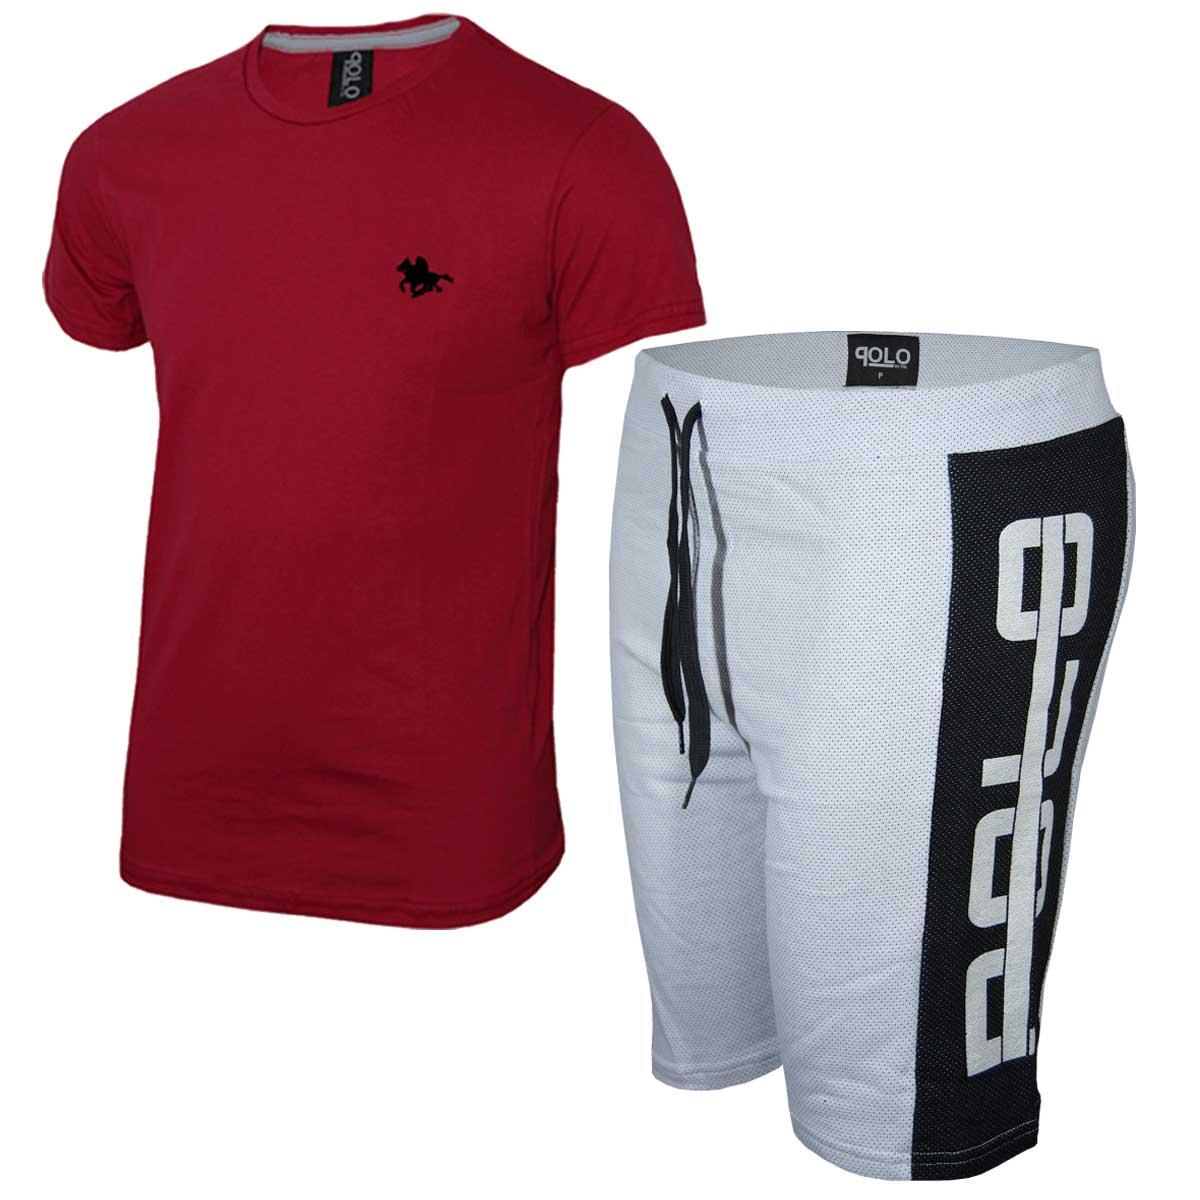 Kit Camiseta Vermelha e Bermuda Branca Polo RG518